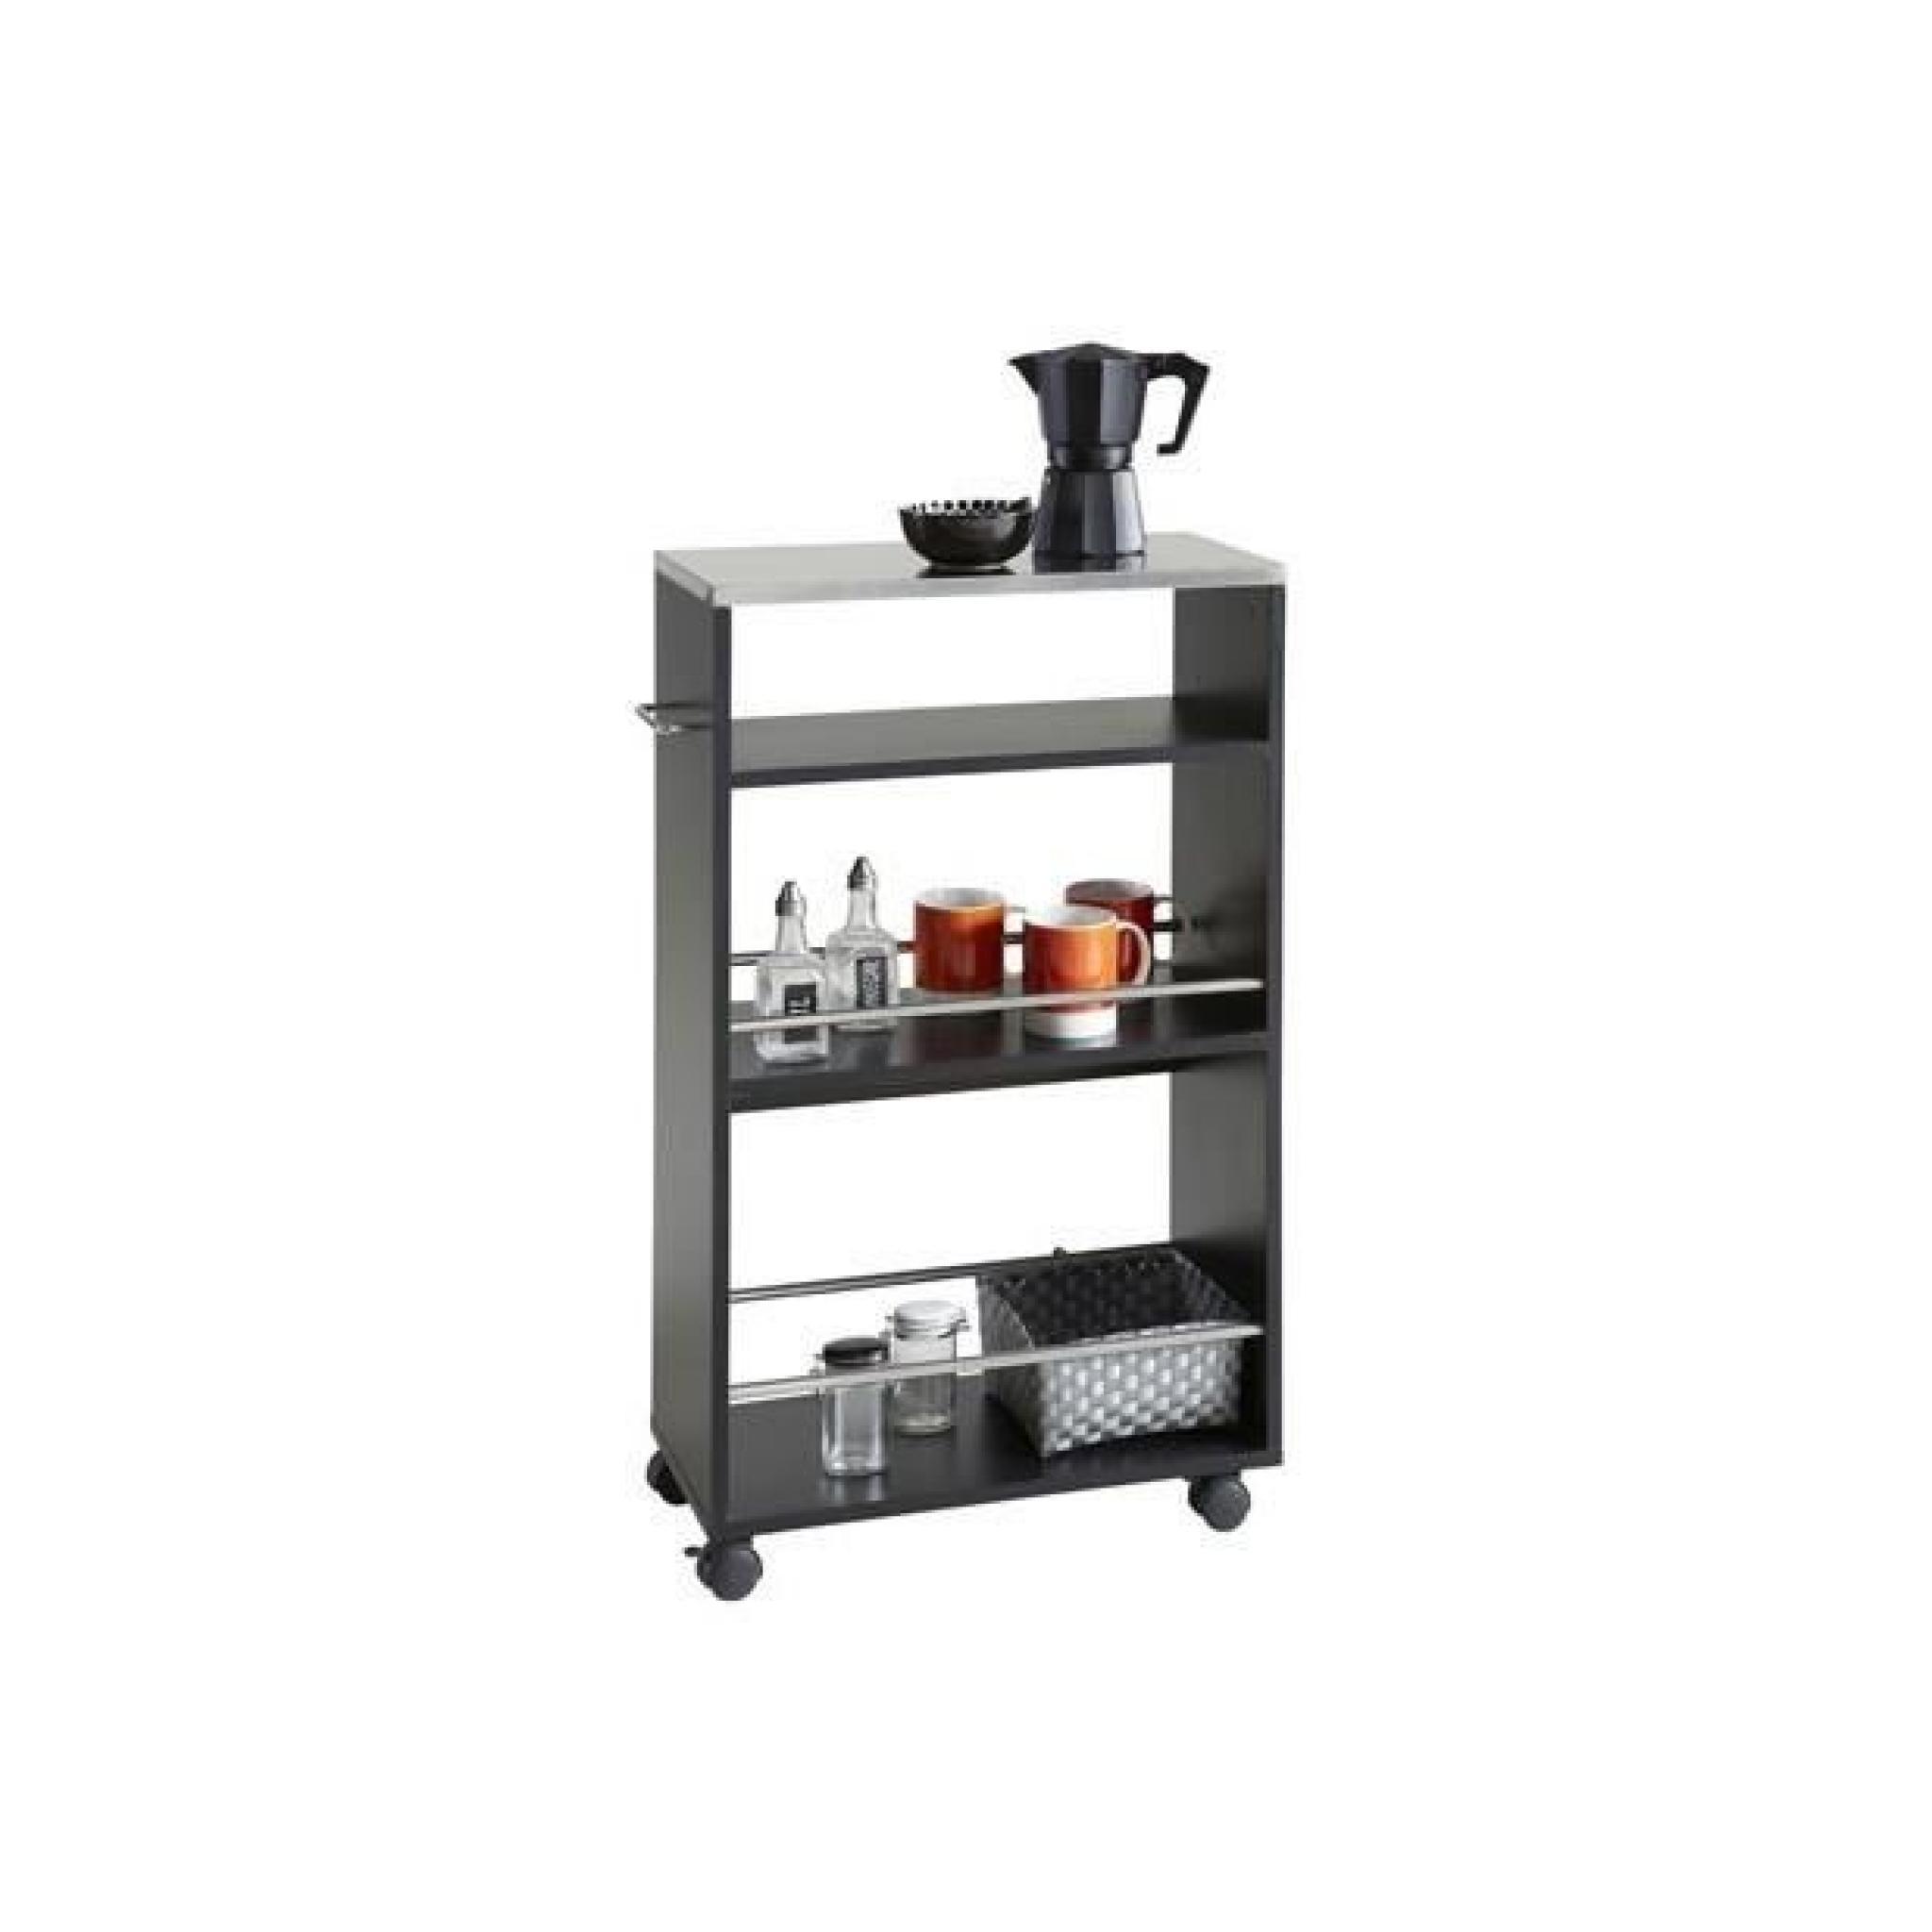 desserte cuisine coffeenoir achat vente desserte de. Black Bedroom Furniture Sets. Home Design Ideas